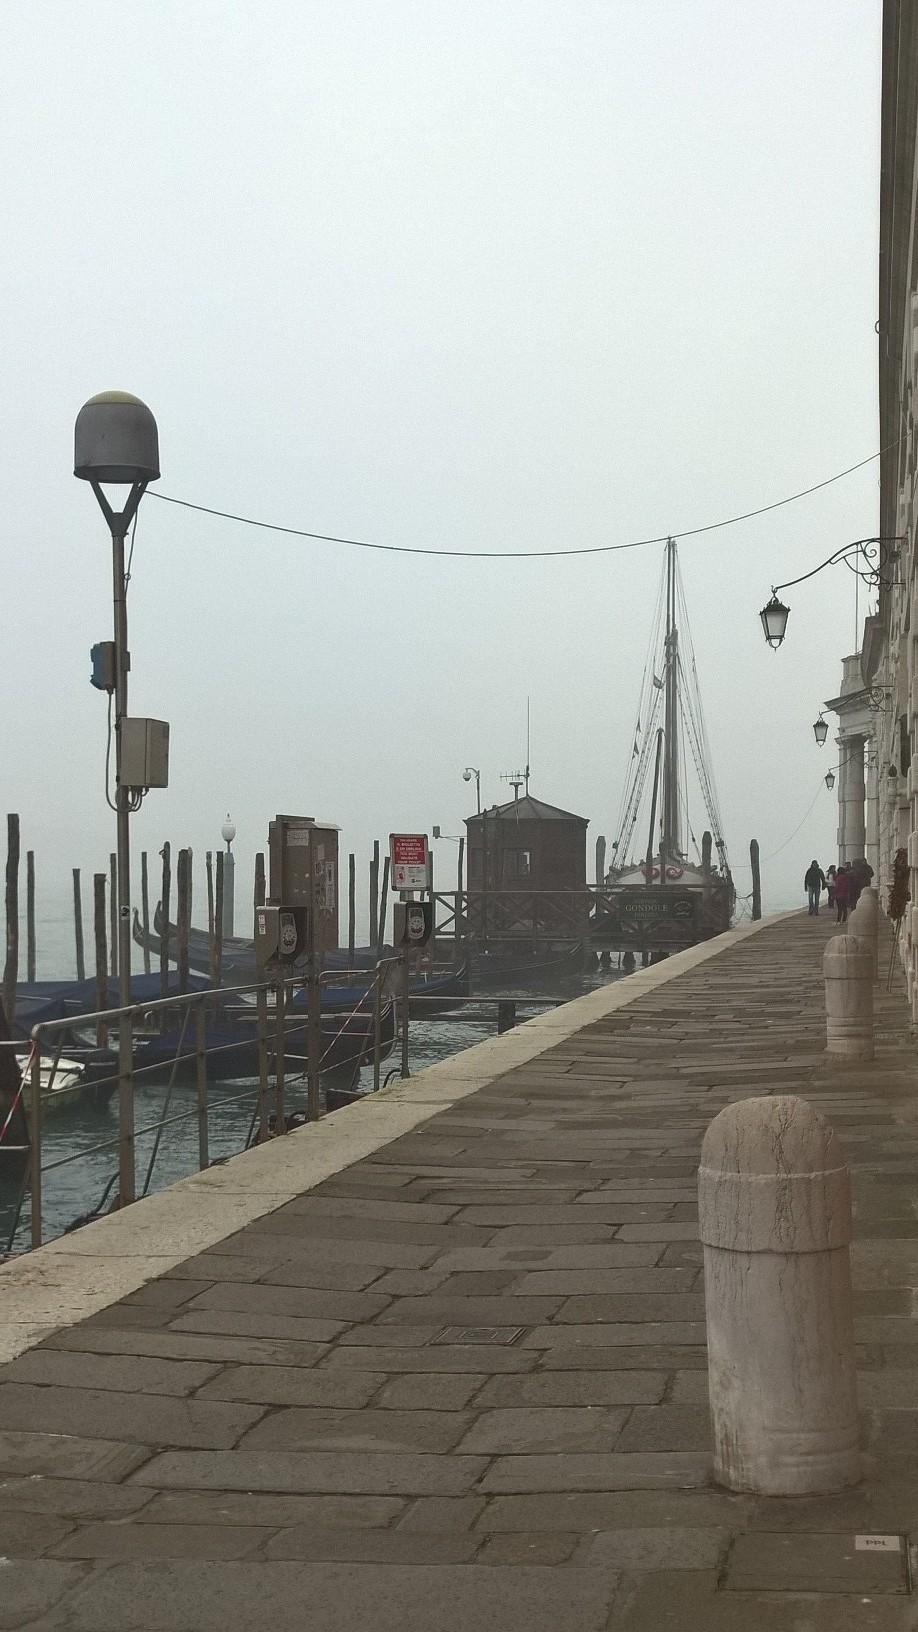 Fondamenta Zattere ai Saloni, Venice © David Hughes